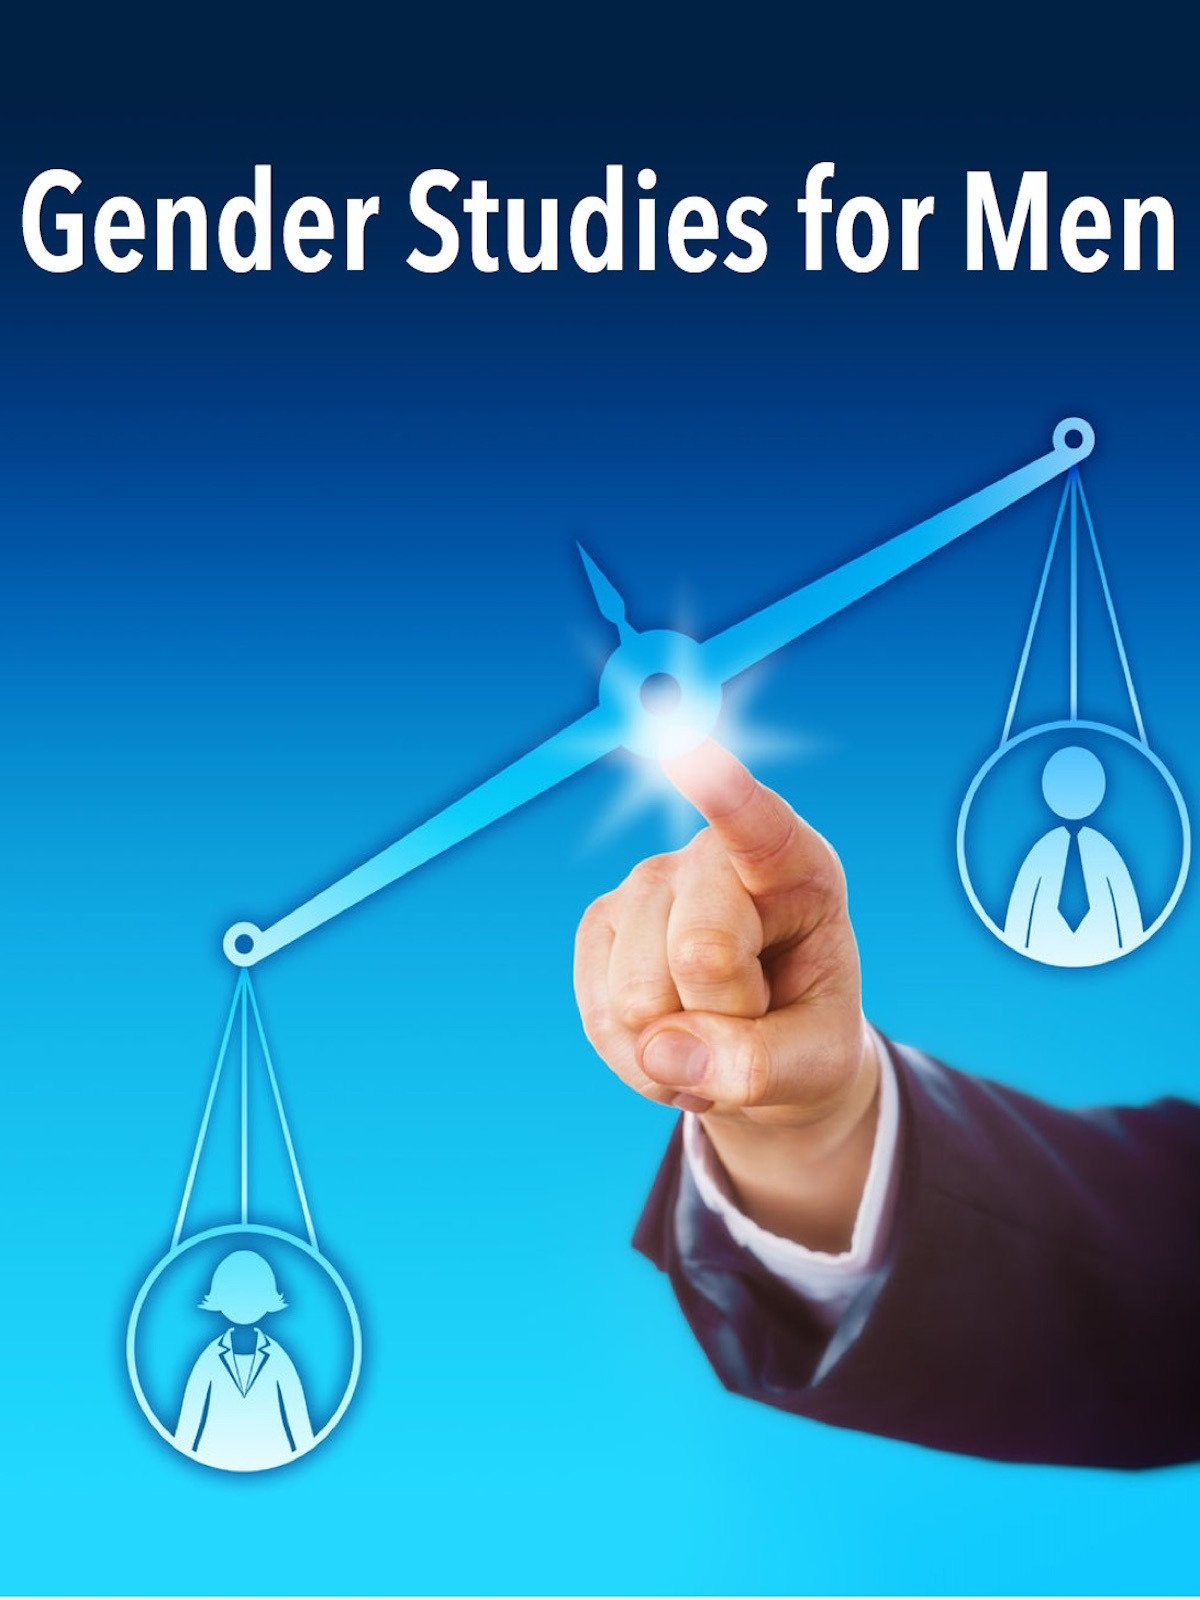 Gender Studies for Men